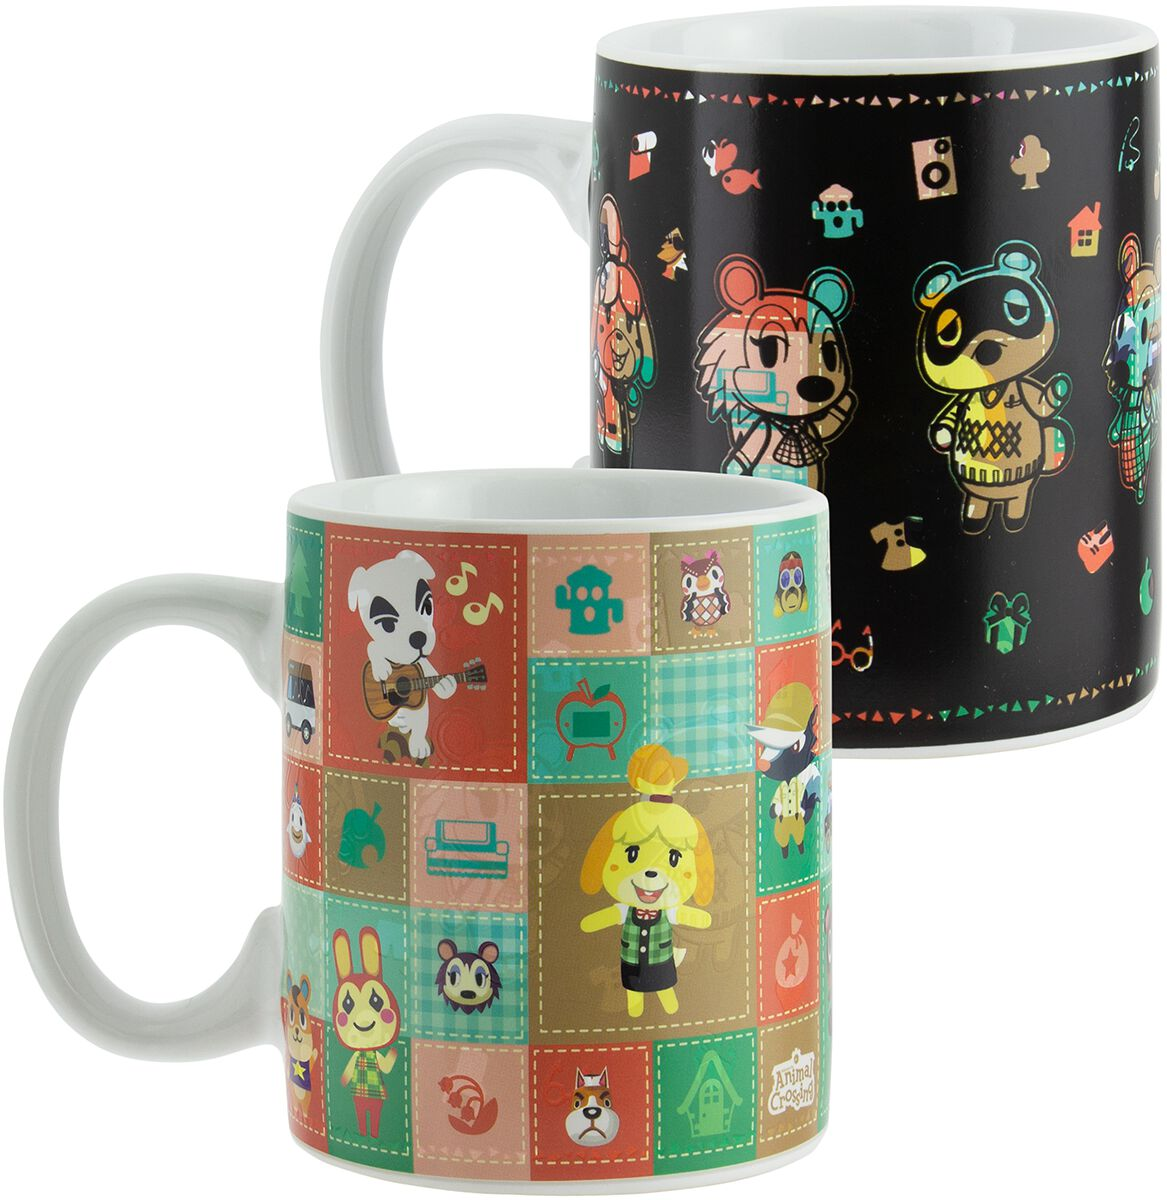 Image of Animal Crossing Characters - Tasse mit Thermoeffekt Tasse multicolor